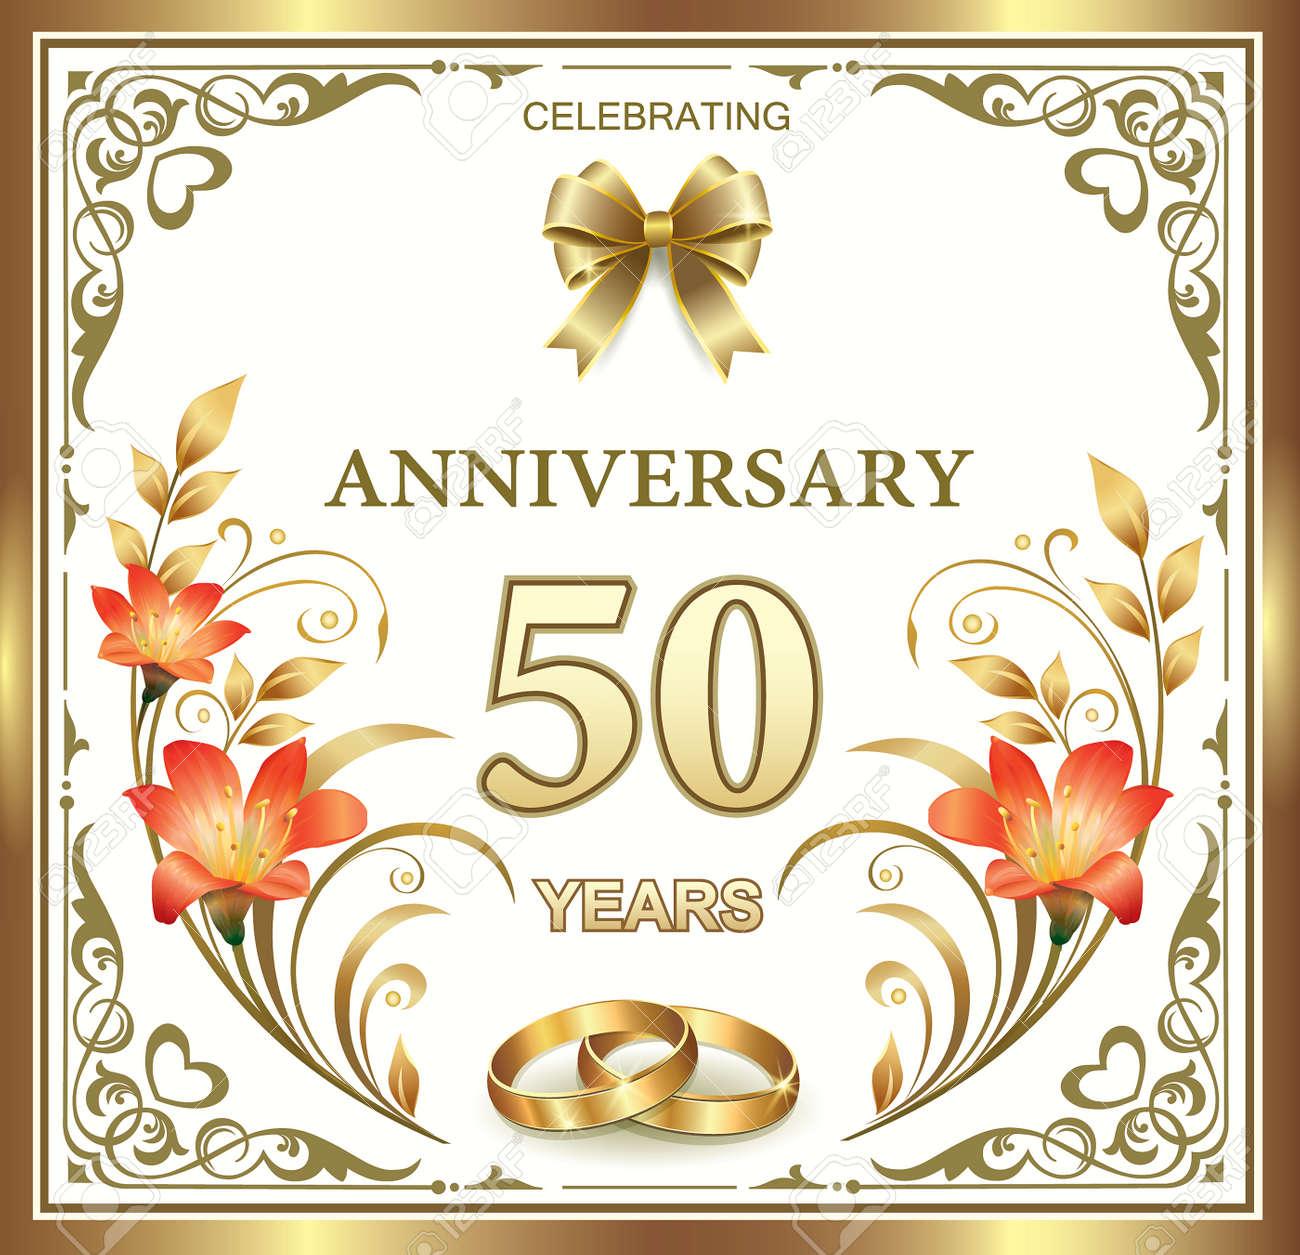 Anniversario Matrimonio Dieci Anni.Vettoriale 50 Anniversario Di Matrimonio Image 42150655